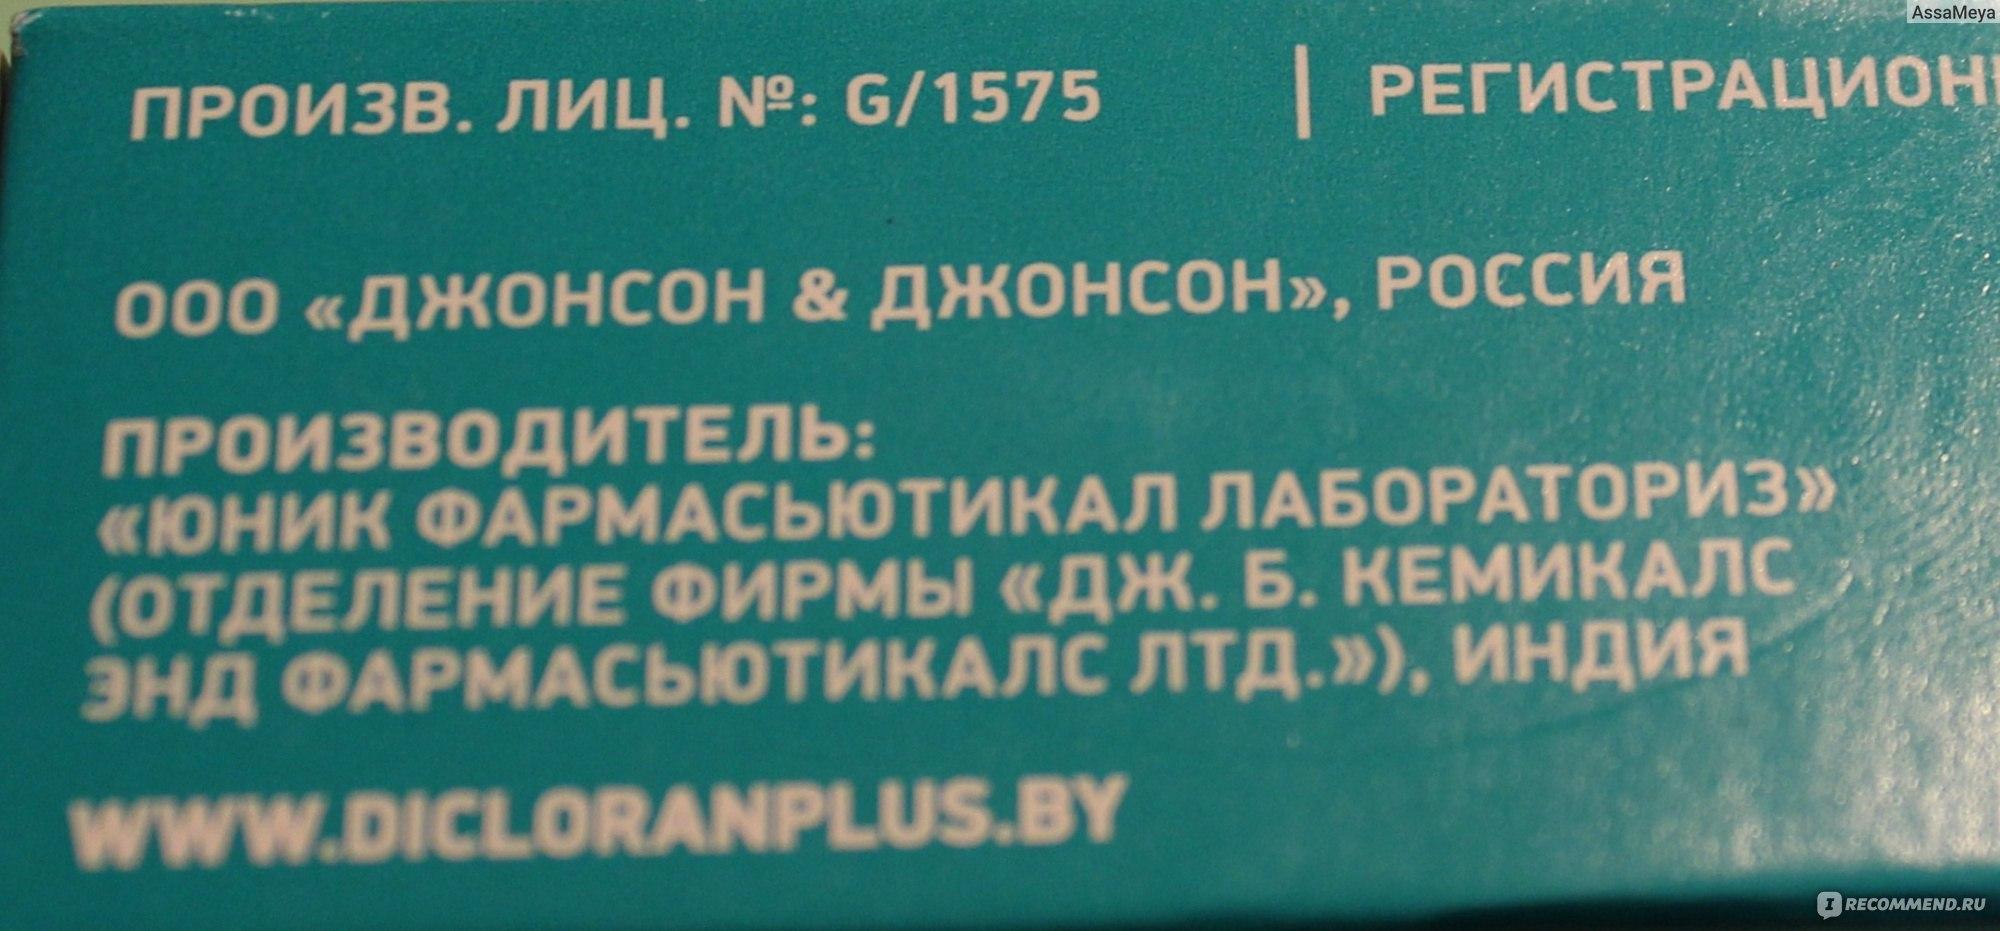 Правила использования препарата диклоран плюс